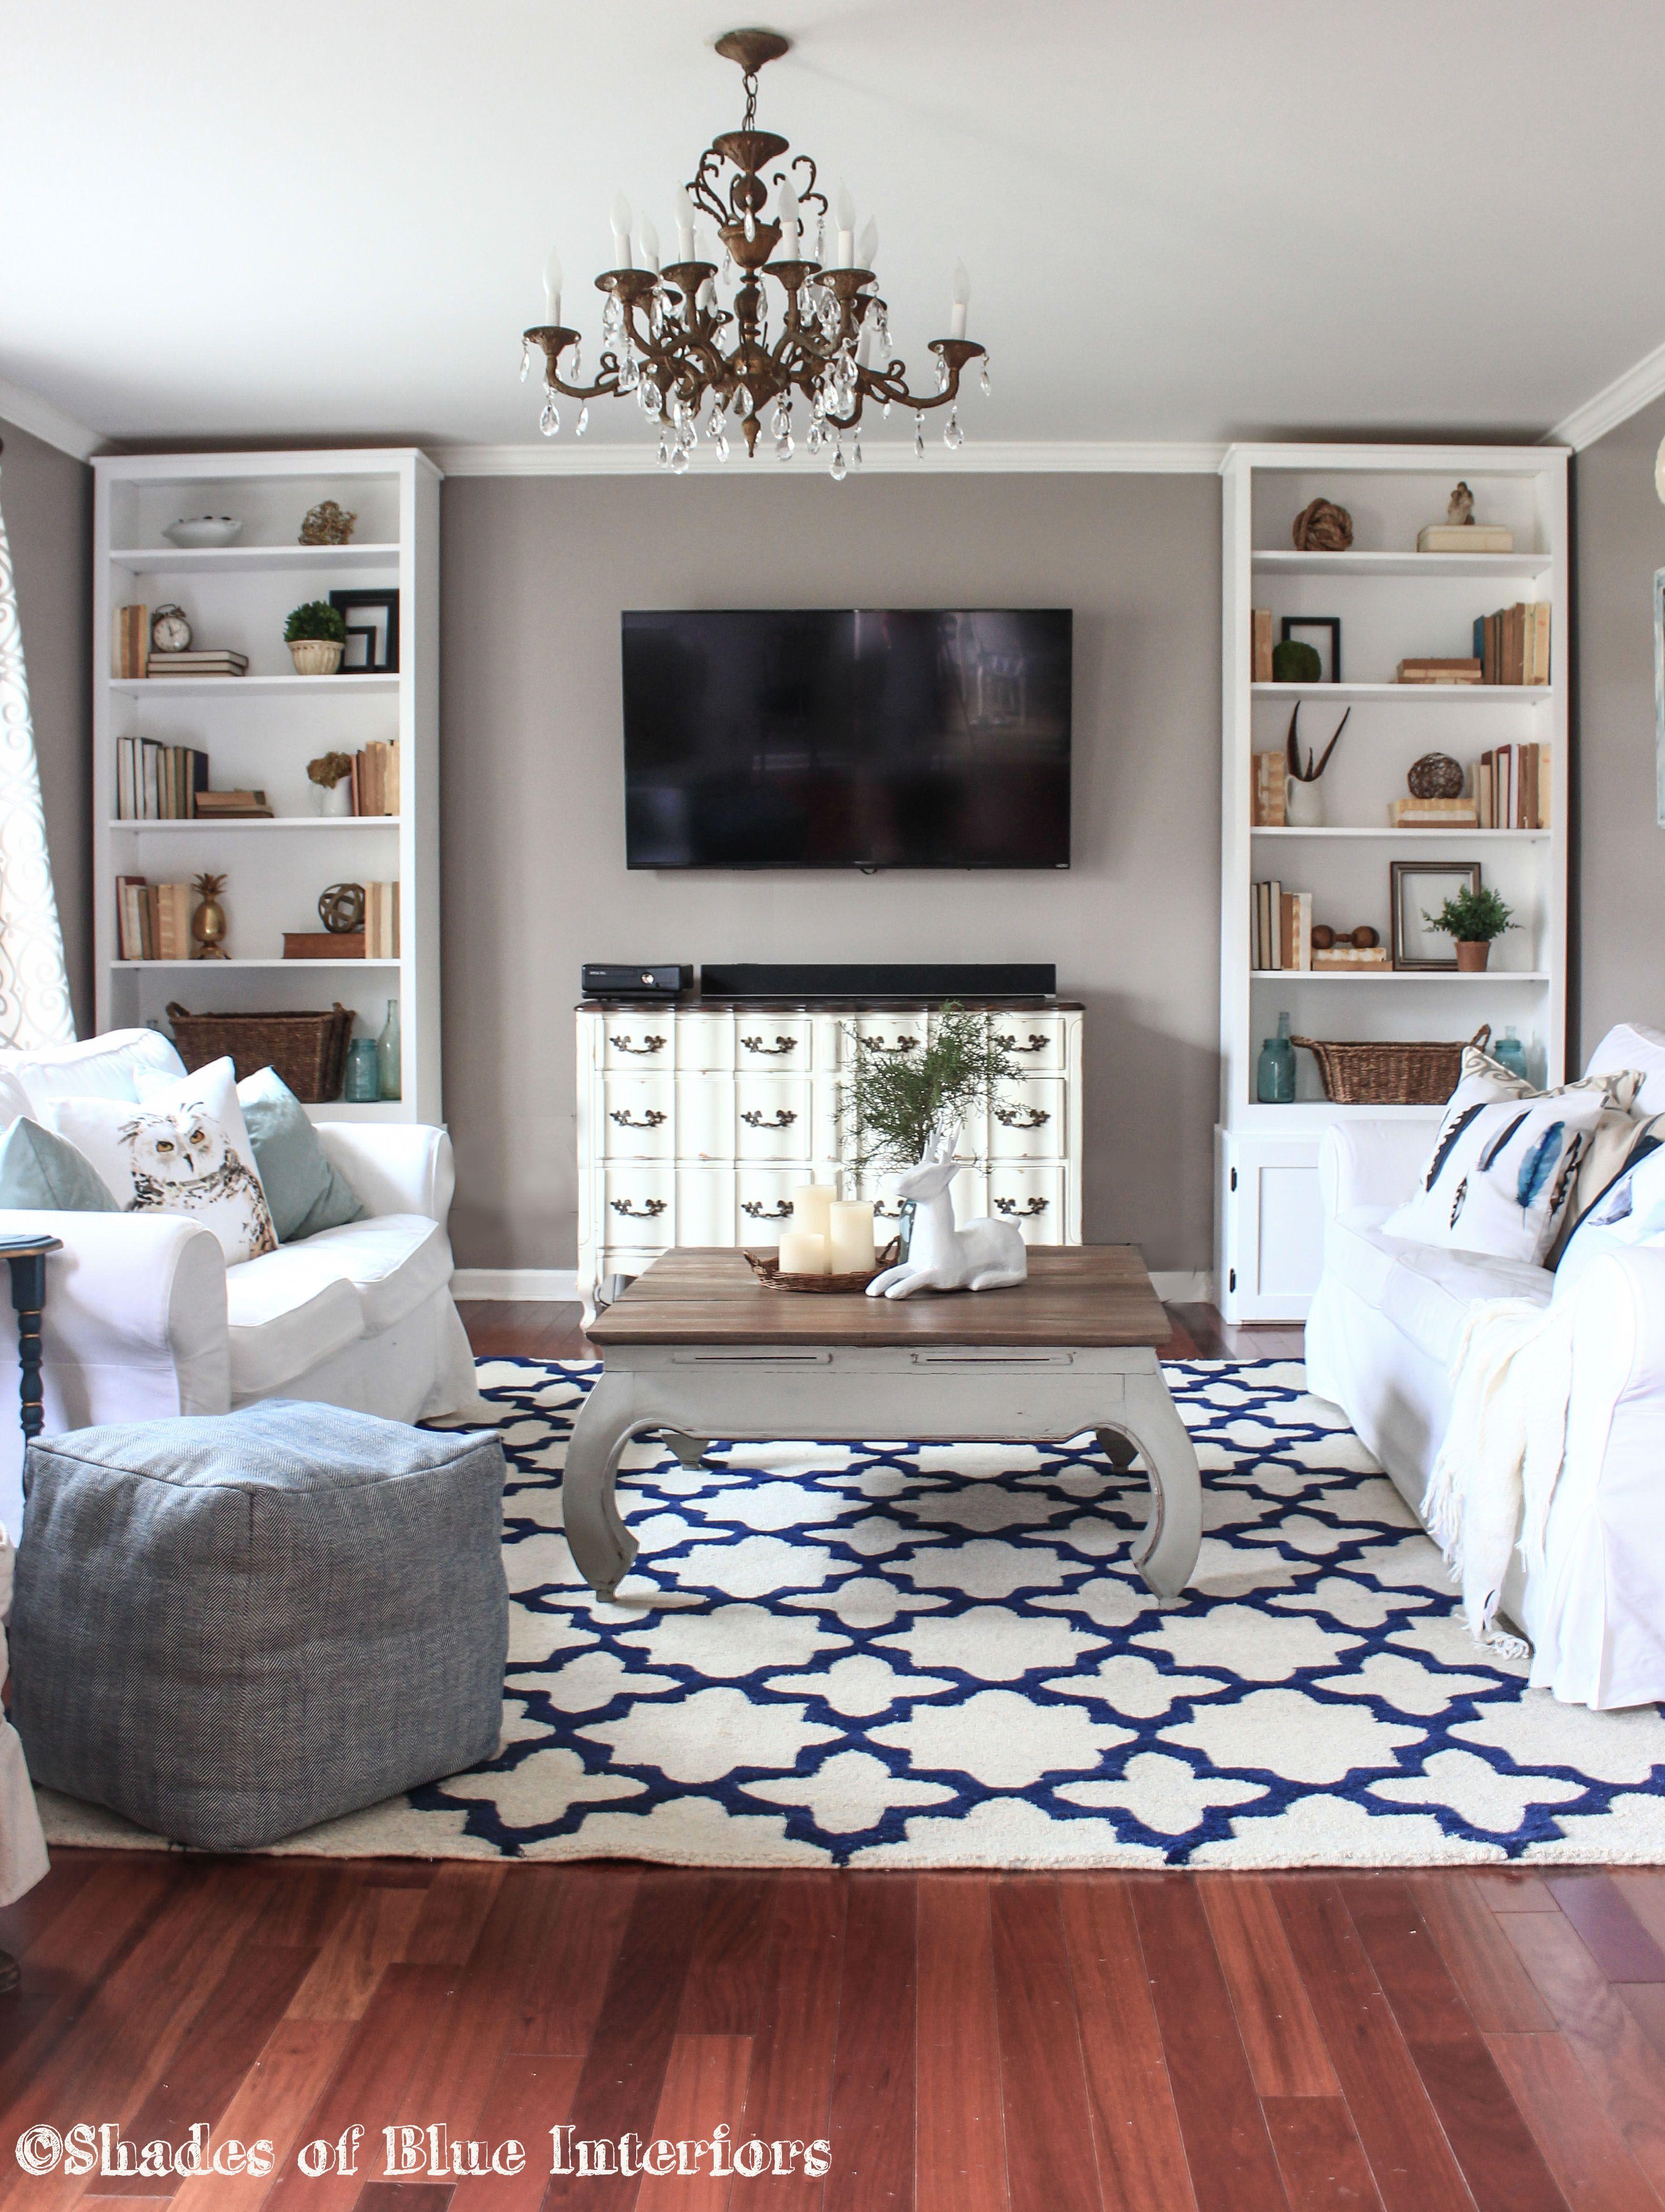 New Living Room Rug Rugs In Living Room Farm House Living Room Modern Farmhouse Living Room Decor